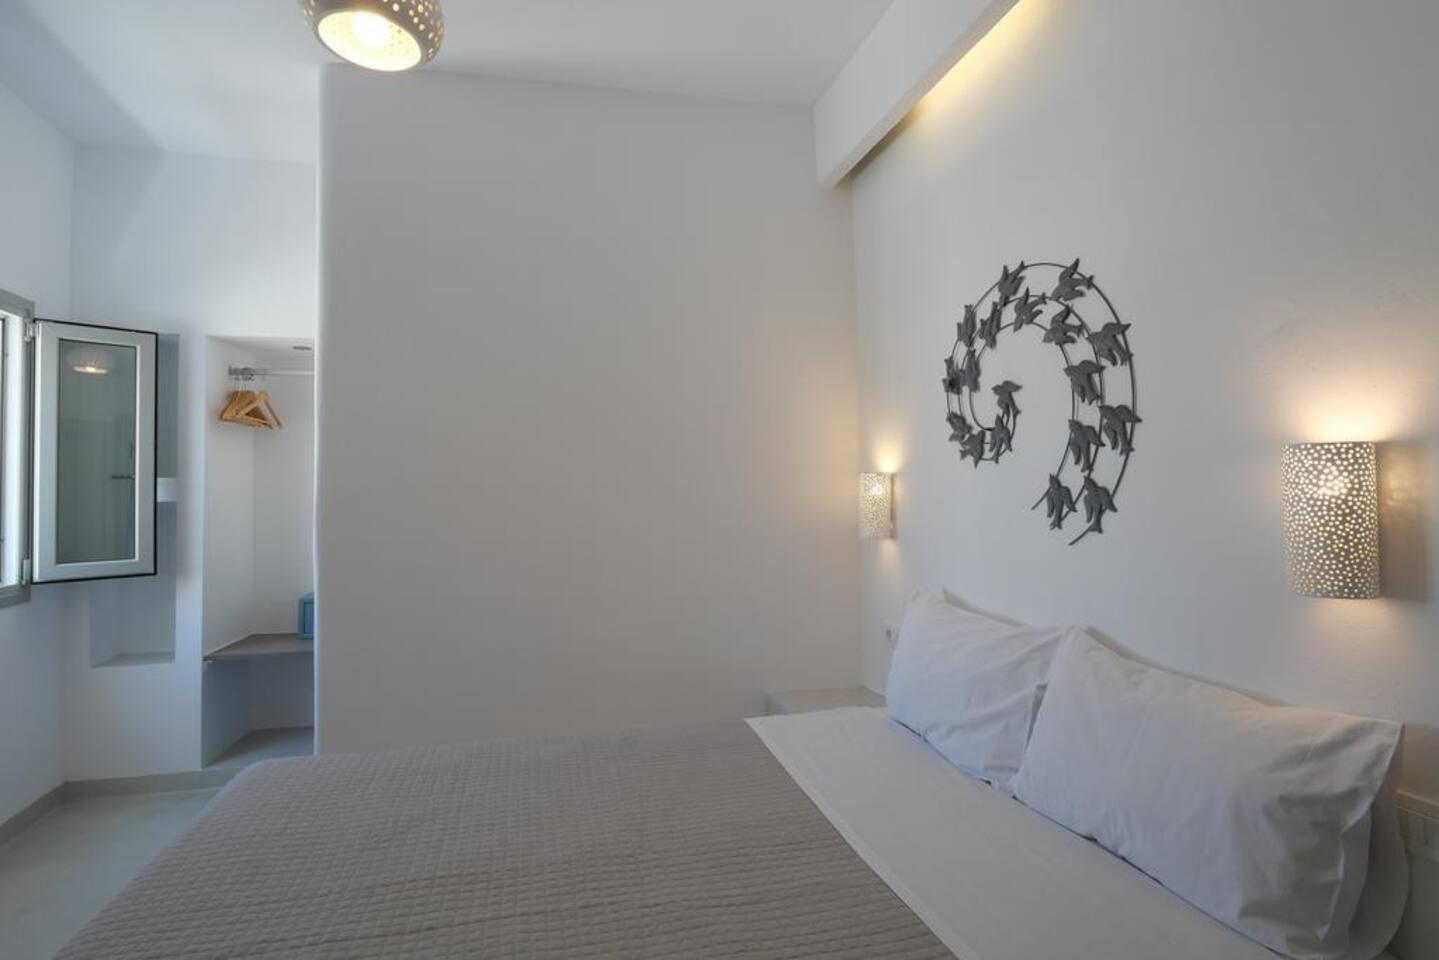 SANTORINI CENTER DOUBLE ROOM (BRAND NEW)